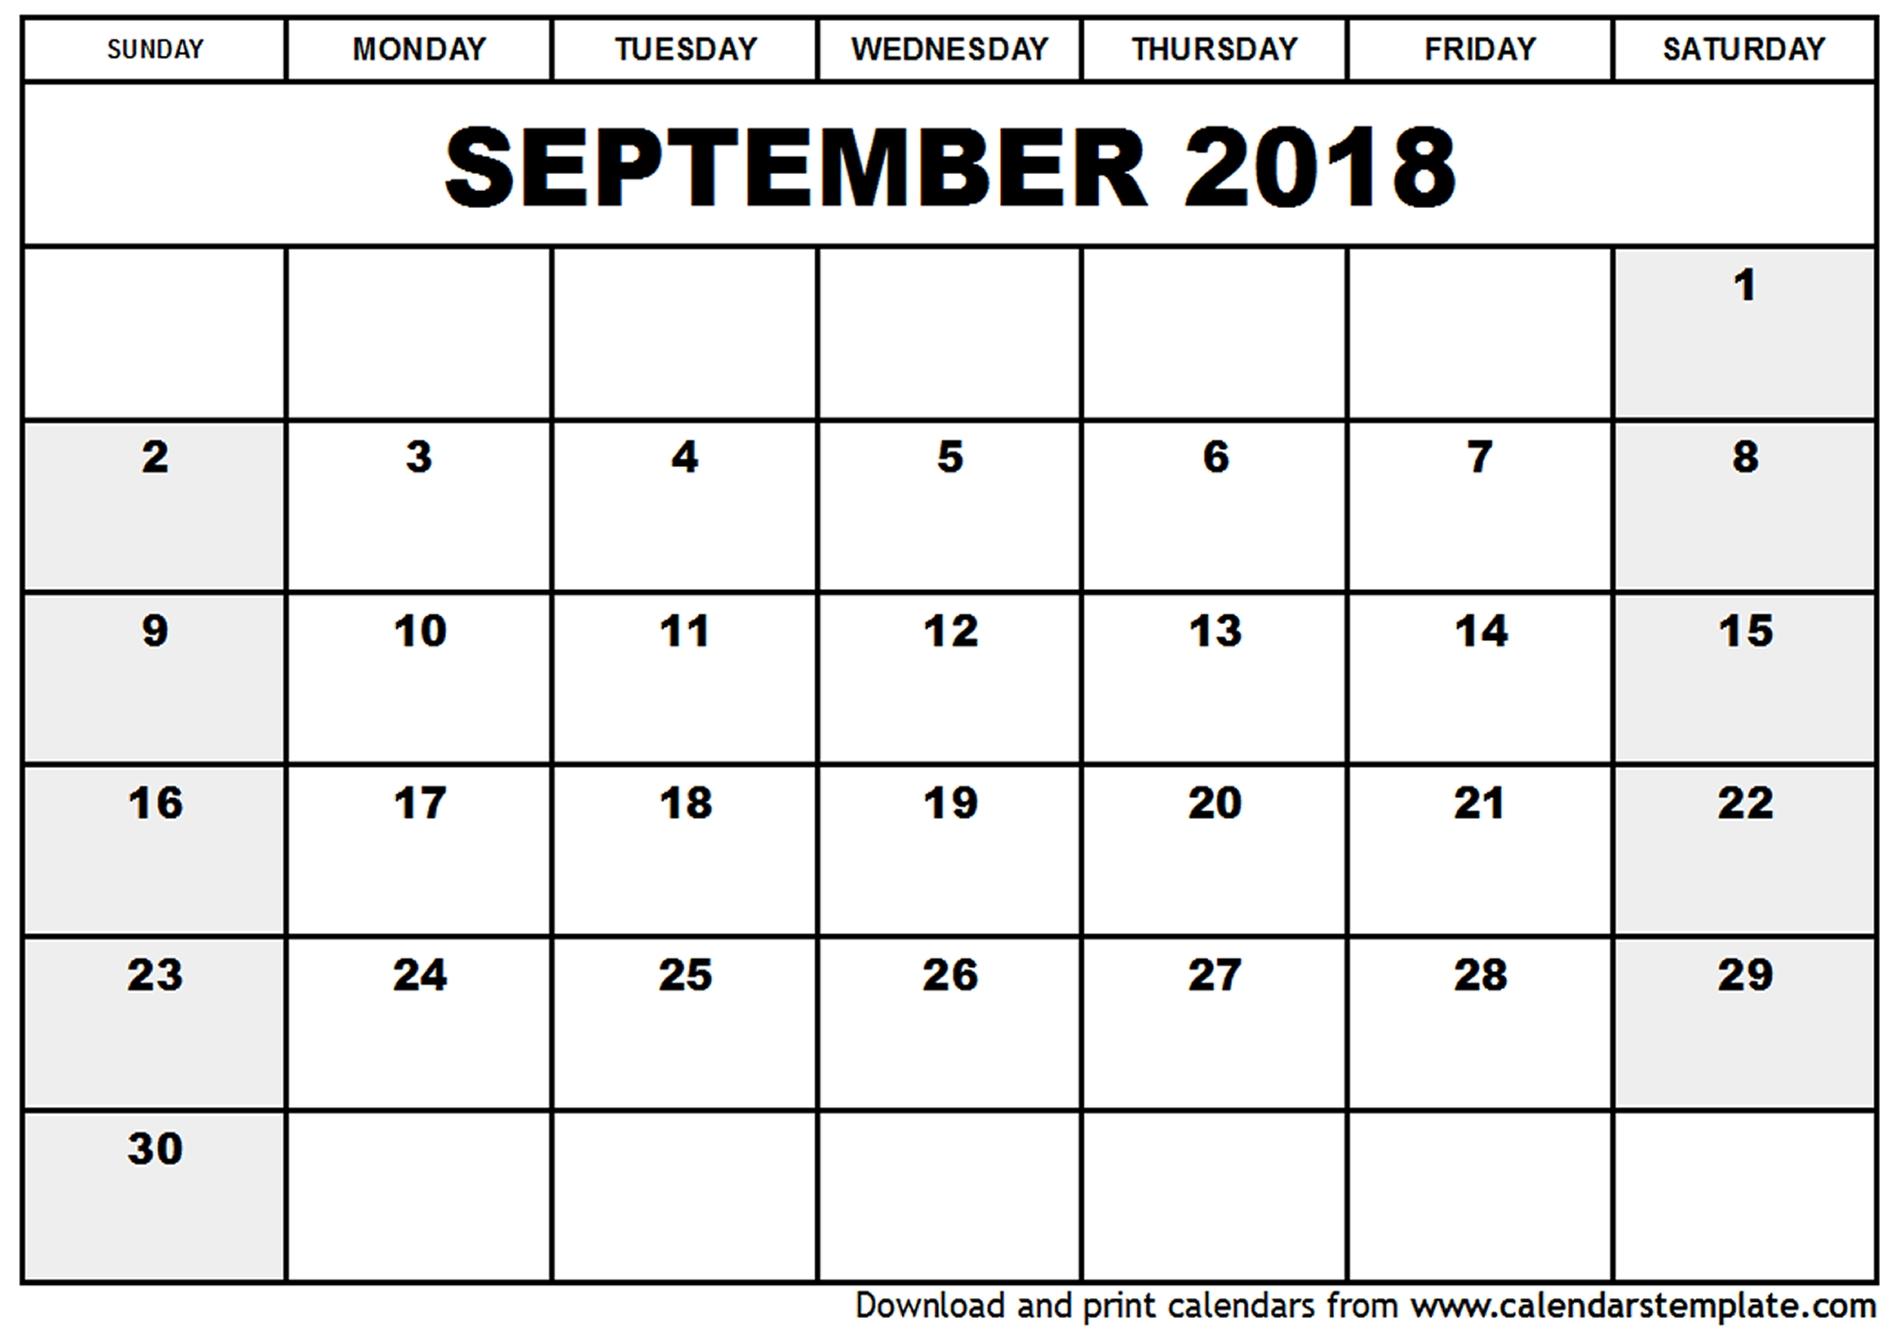 September Monthly Calendar 2018 Fieldstationco  Xjb